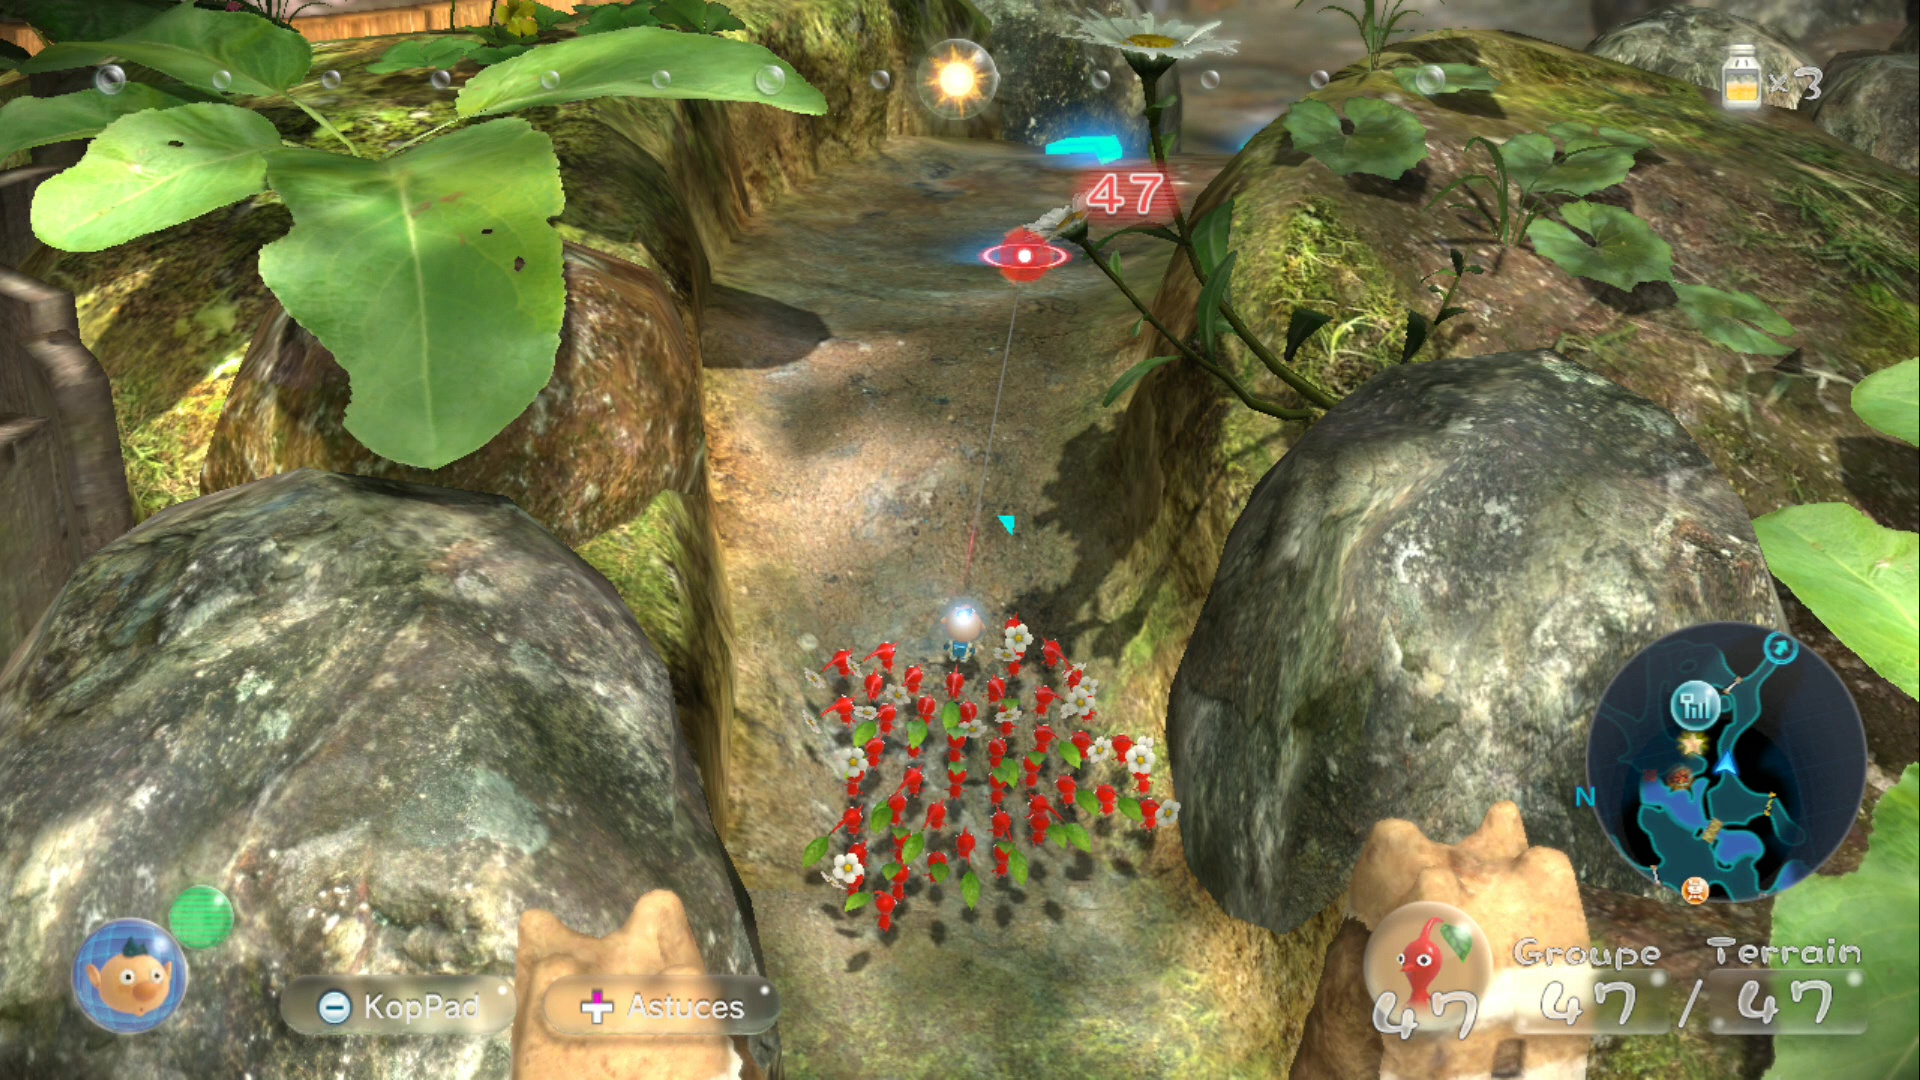 Test de jeu - Pikmin 3 Deluxe